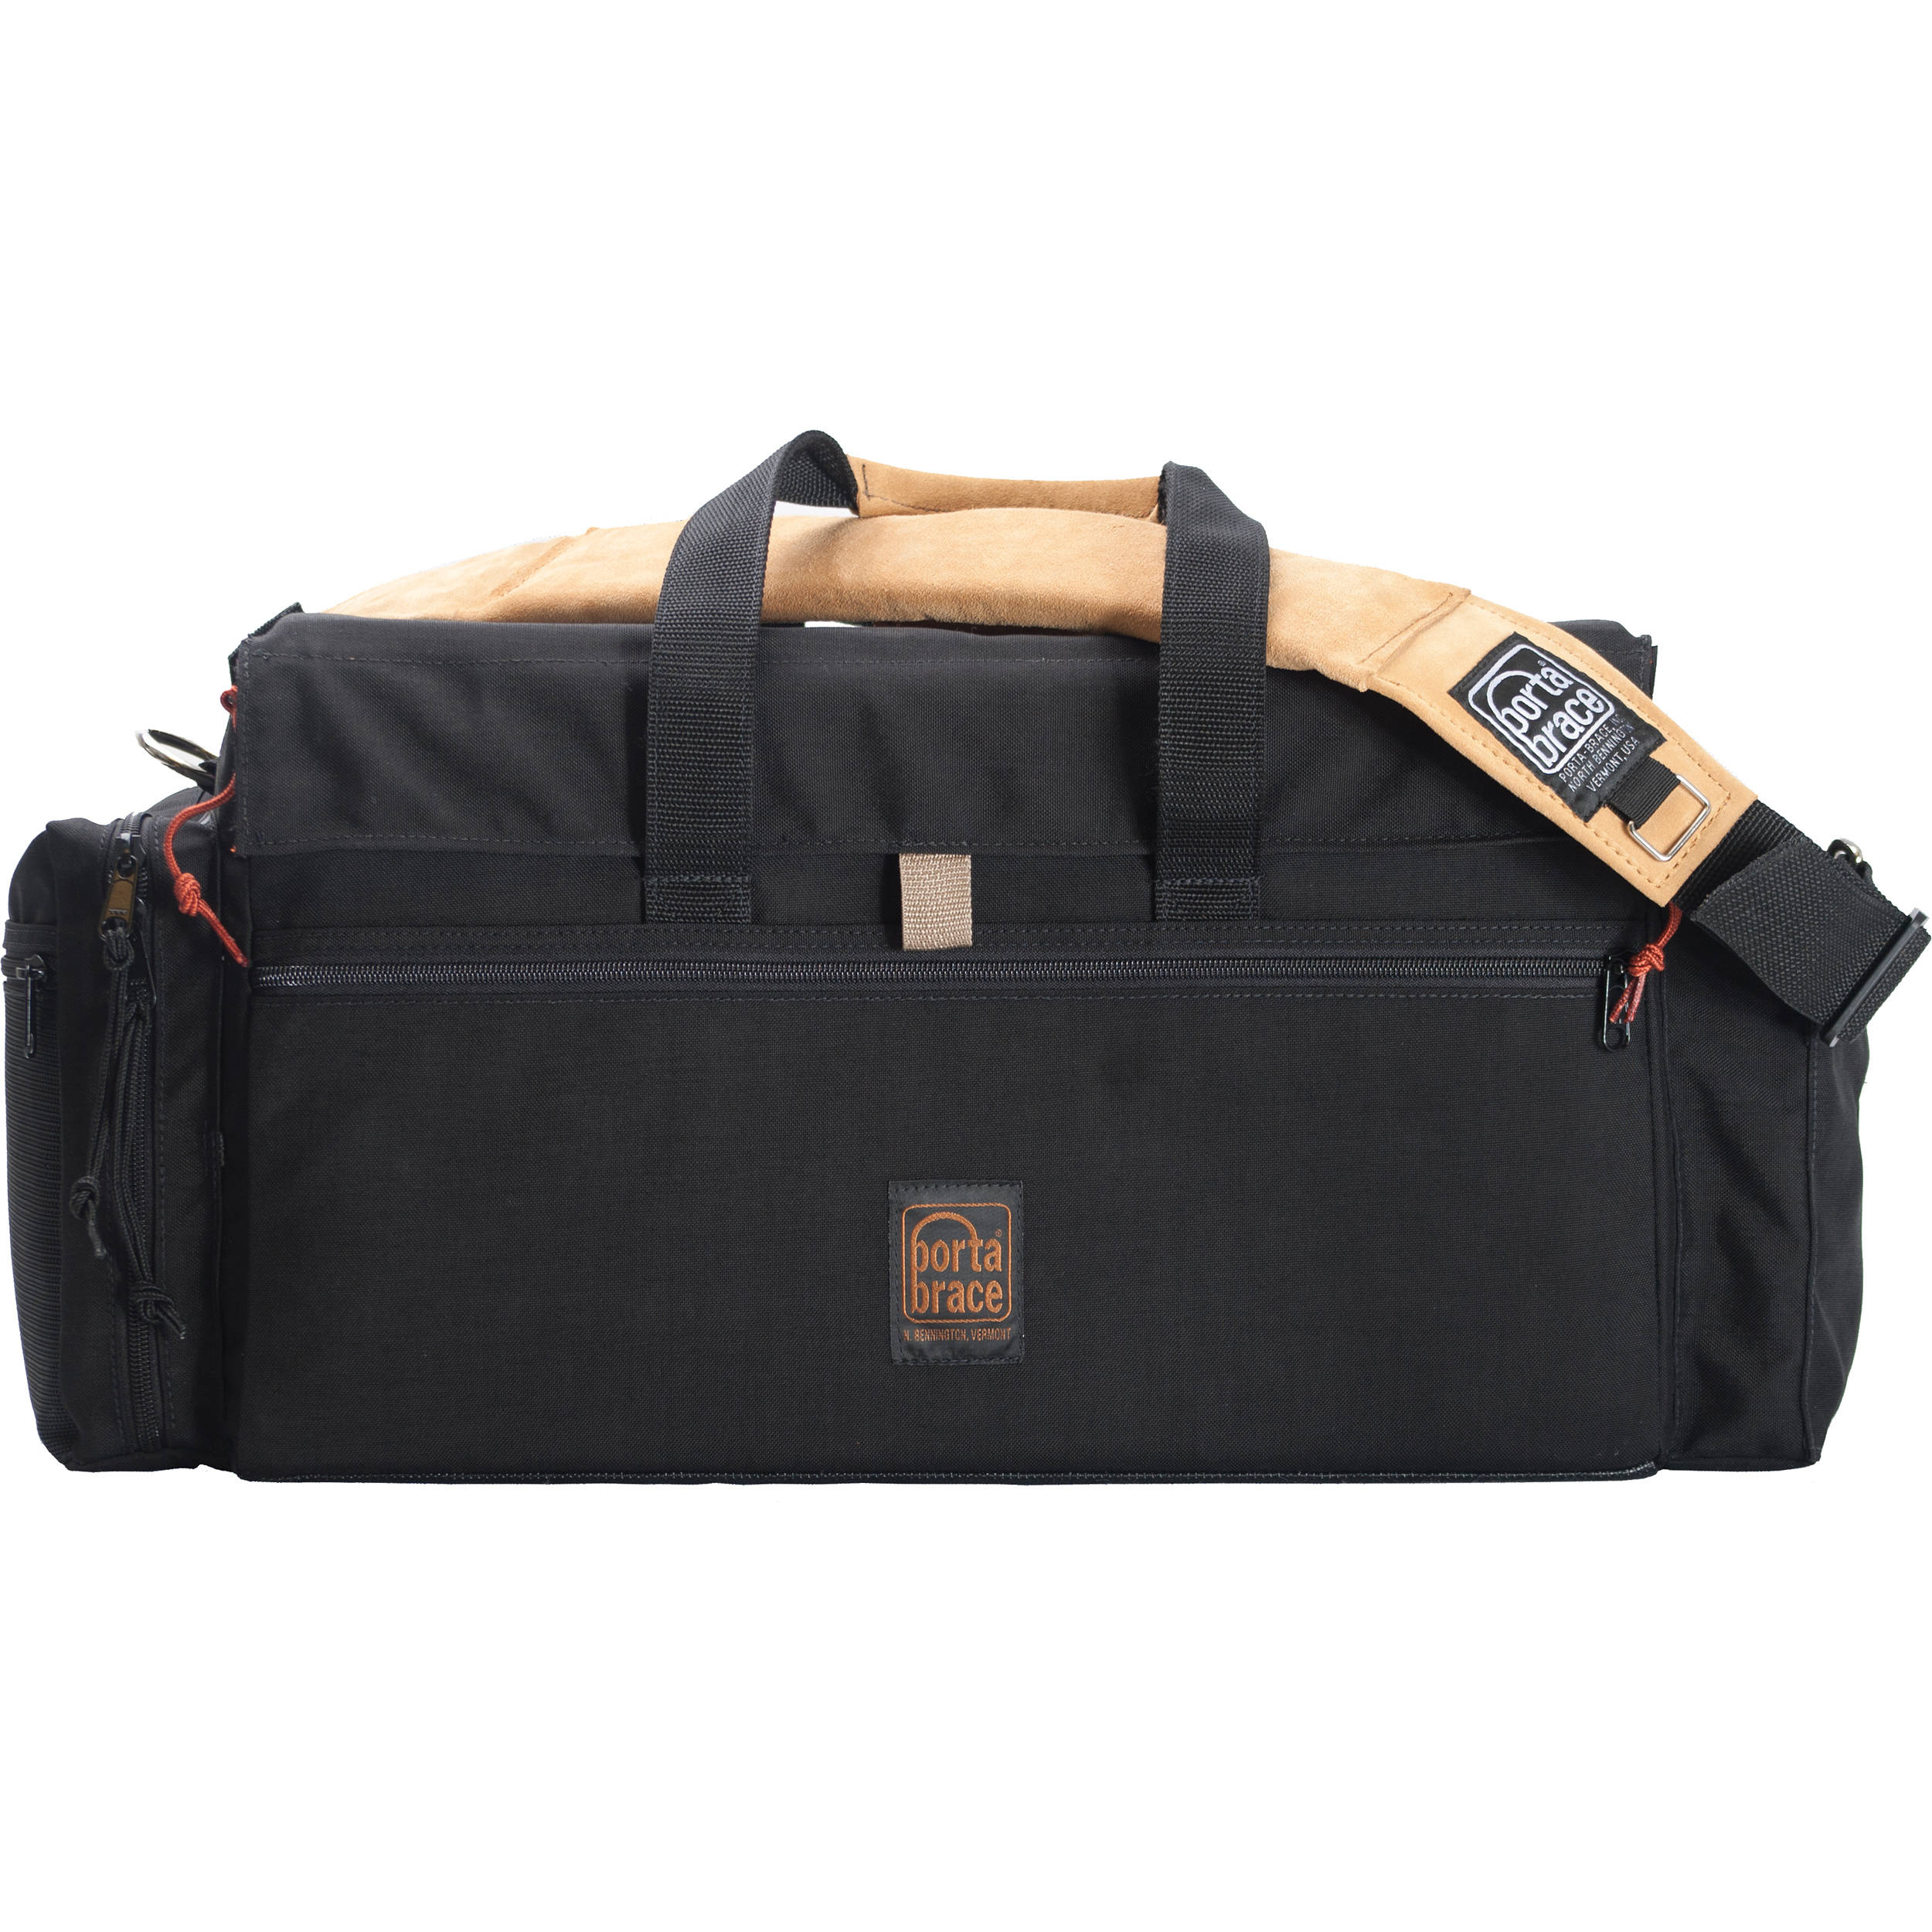 Porta Brace DVO-3-QS-M4 DV Organizer Case (Black with Copper Trim)